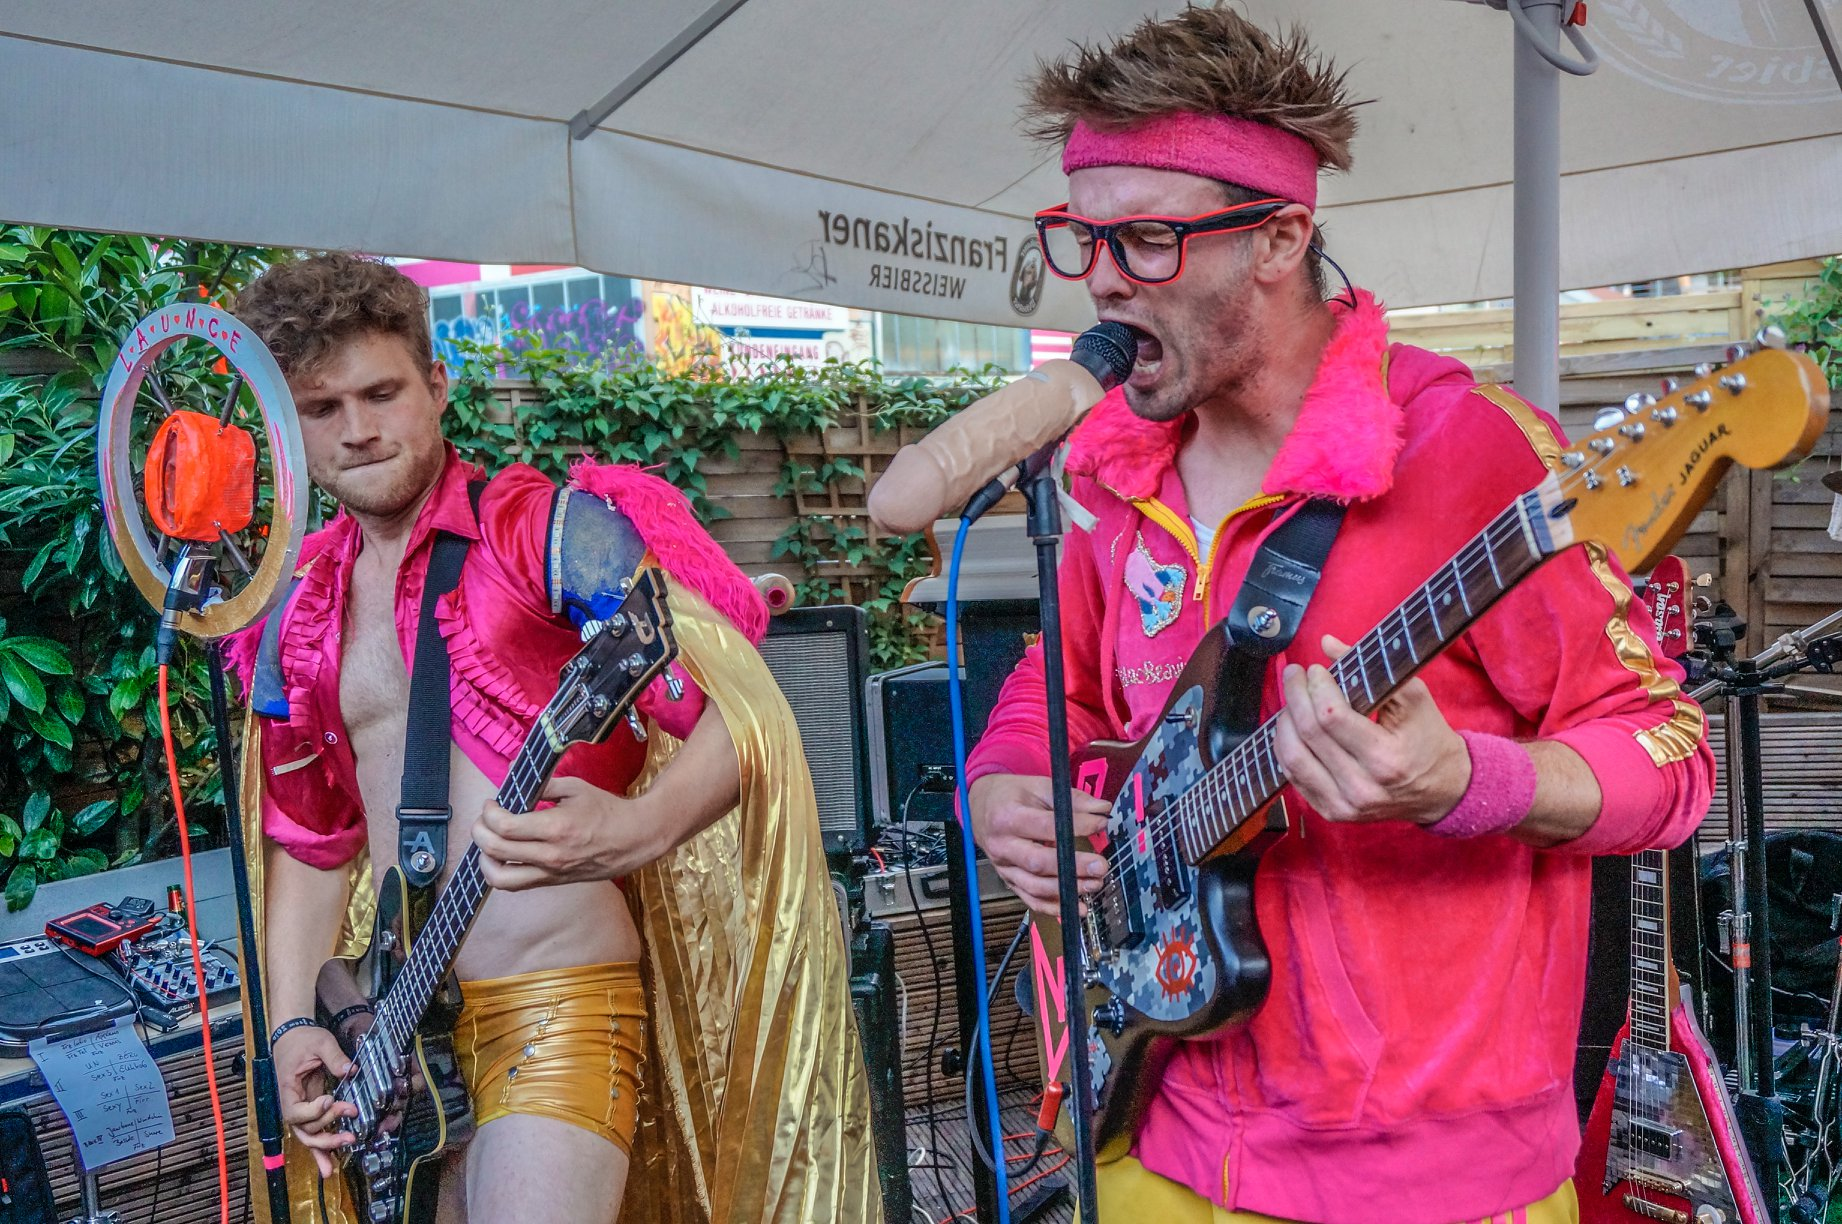 Feté de la musique 2018 Launce Band Live Bar zum schmutzigen Hobby